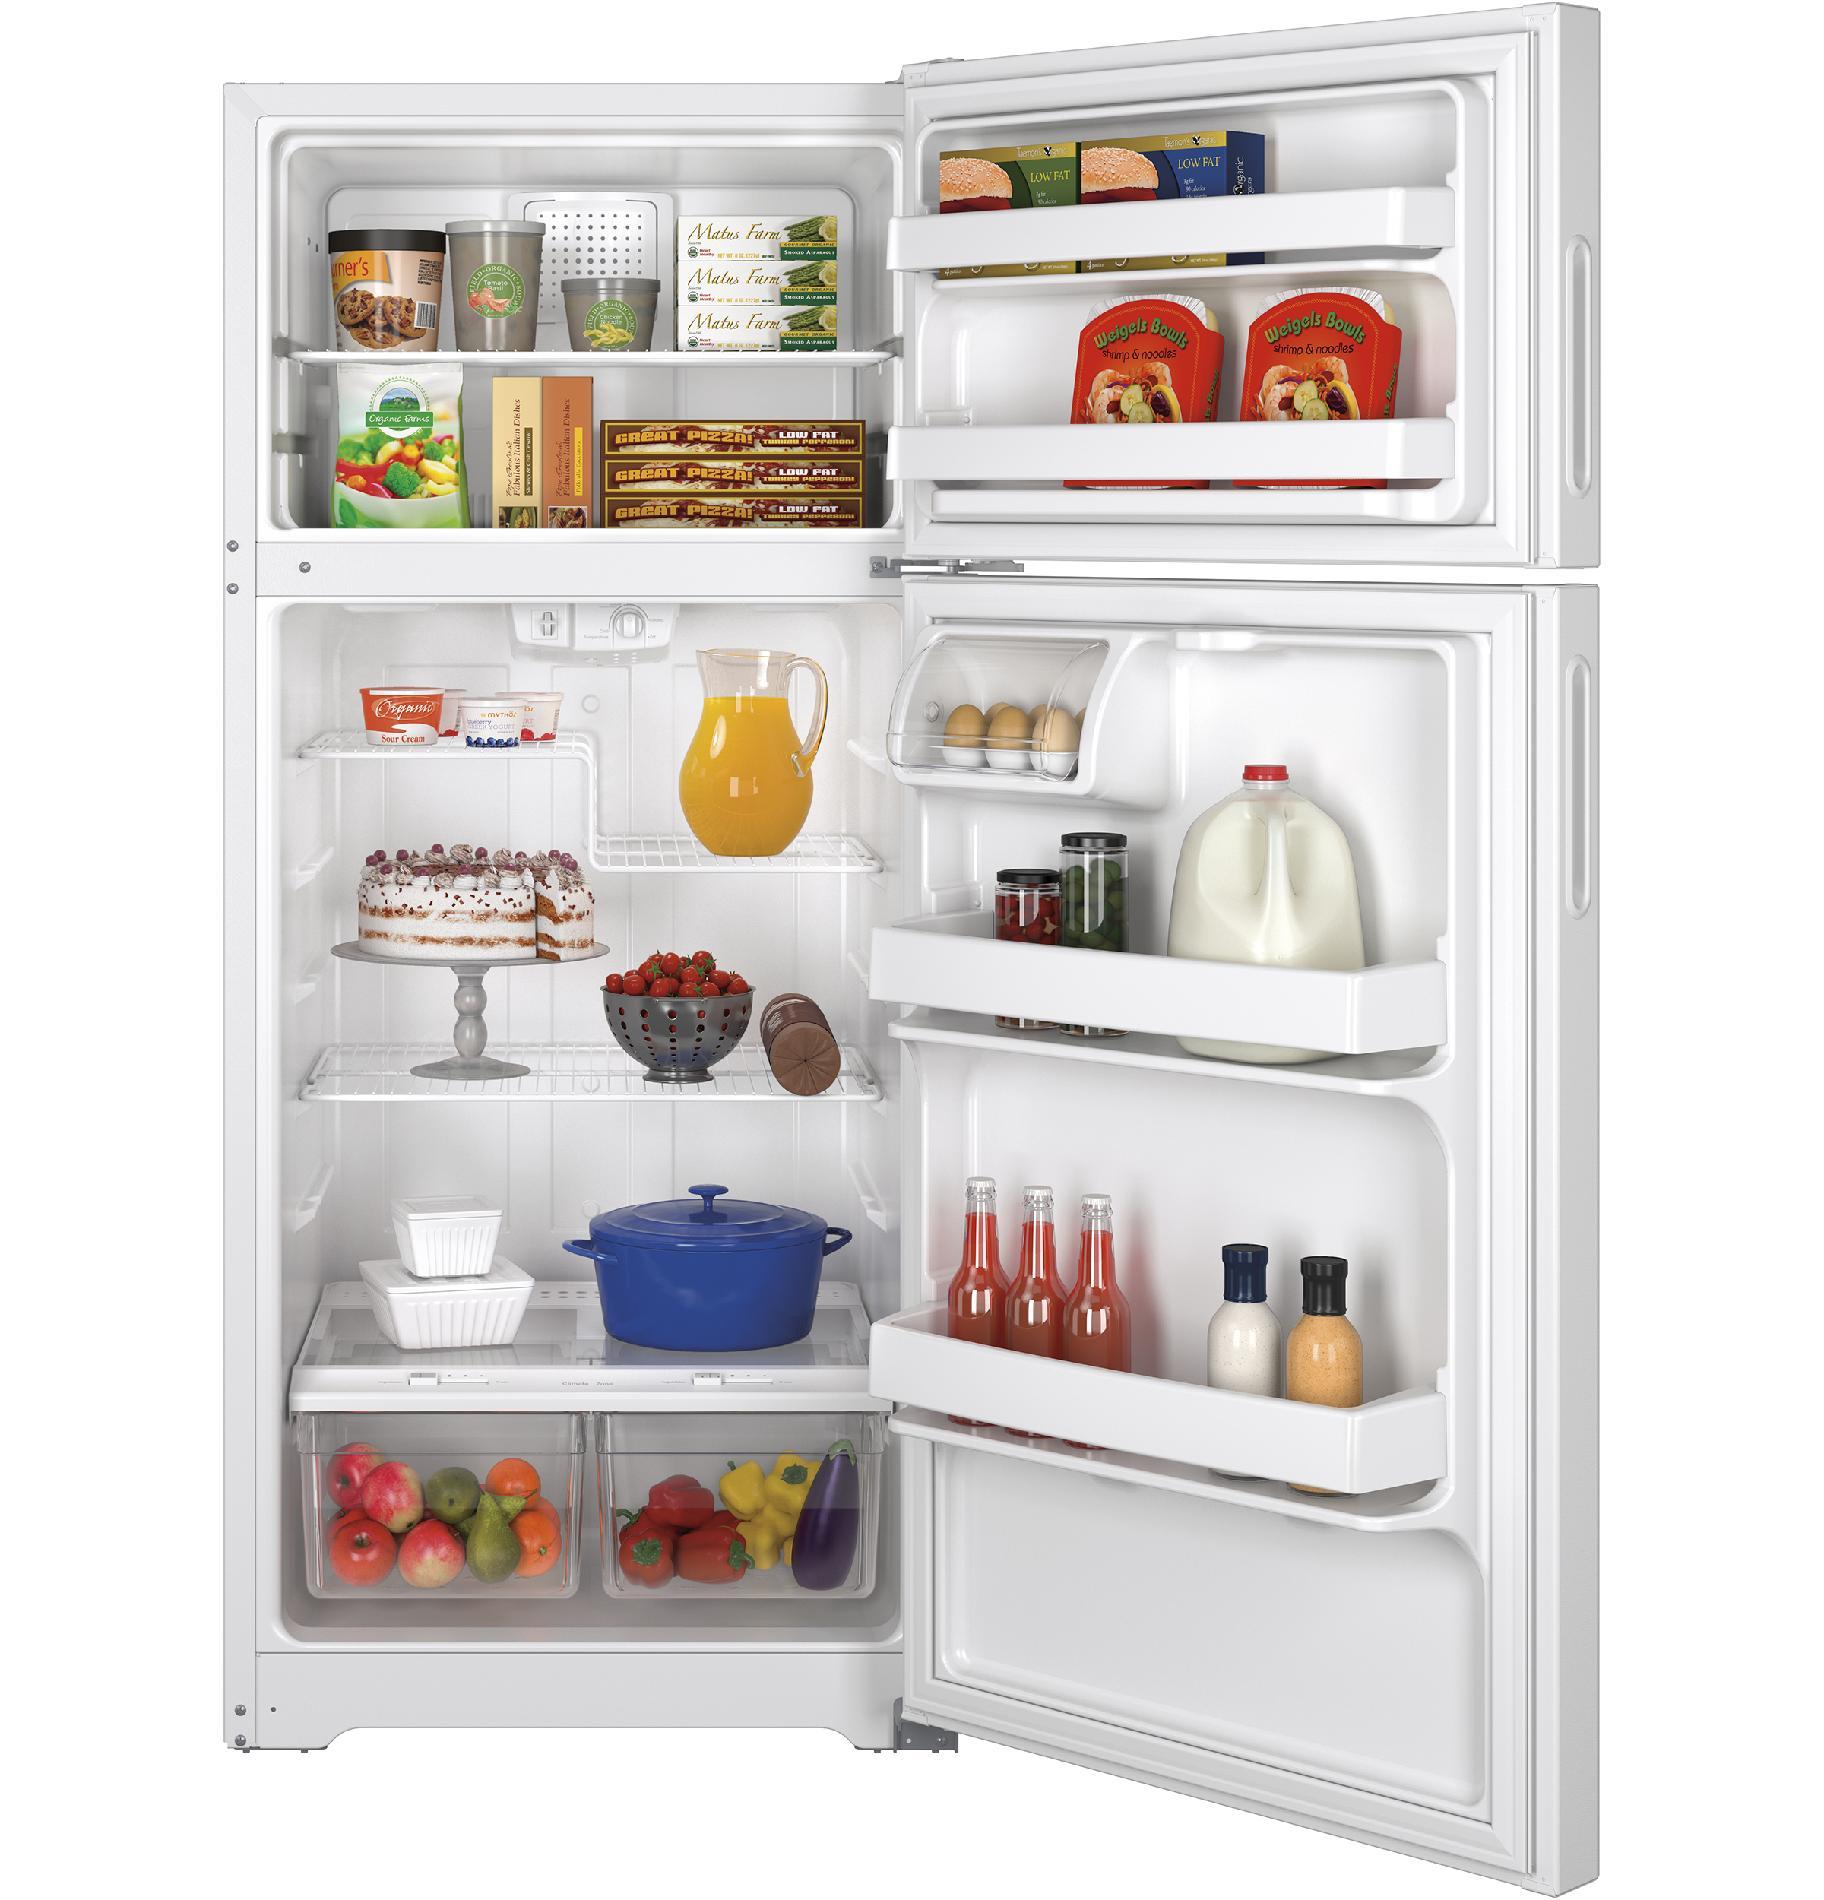 GE Appliances GPE16DTHWW 15.5 cu. ft. Recessed Handle Top-Freezer Refrigerator - White